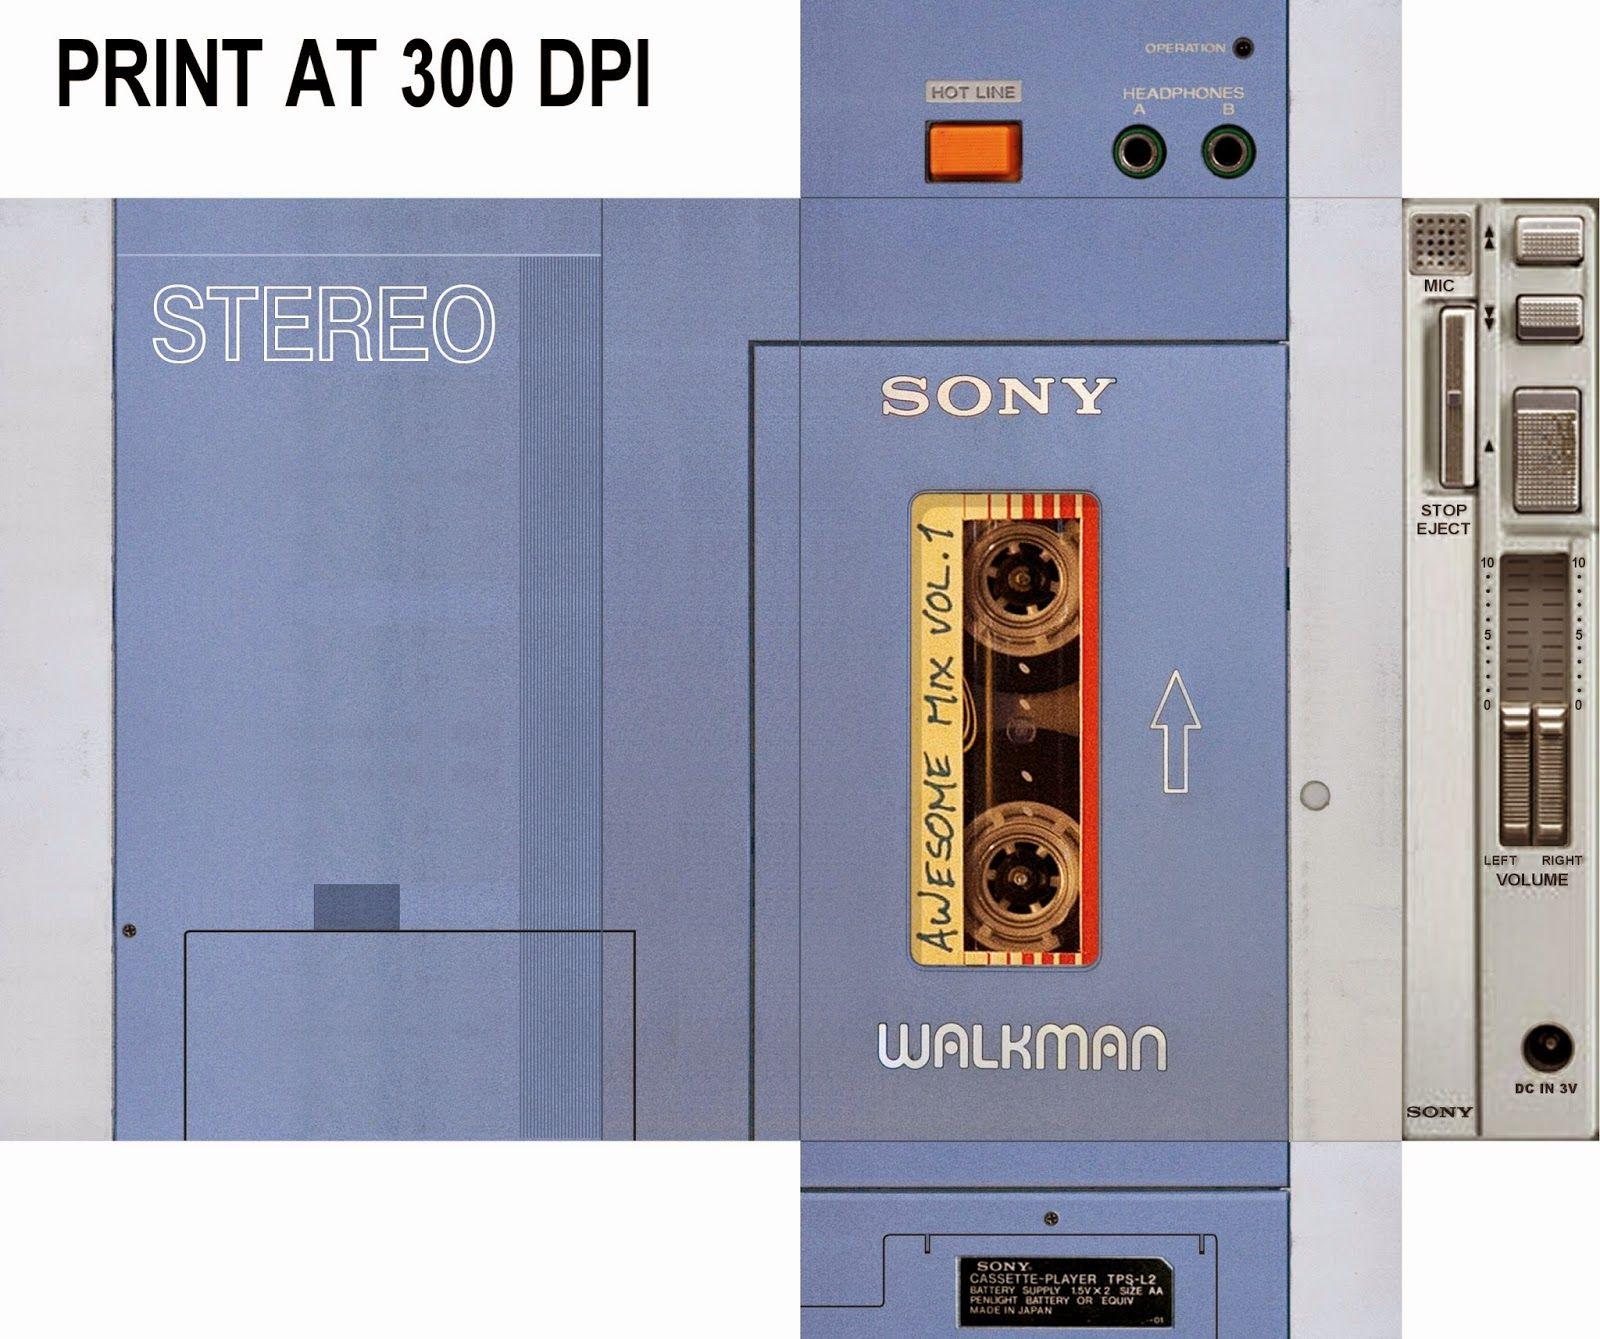 GOTG+Walkman+Printable.jpg 1,600×1,339 pixels | Halloween fun ...